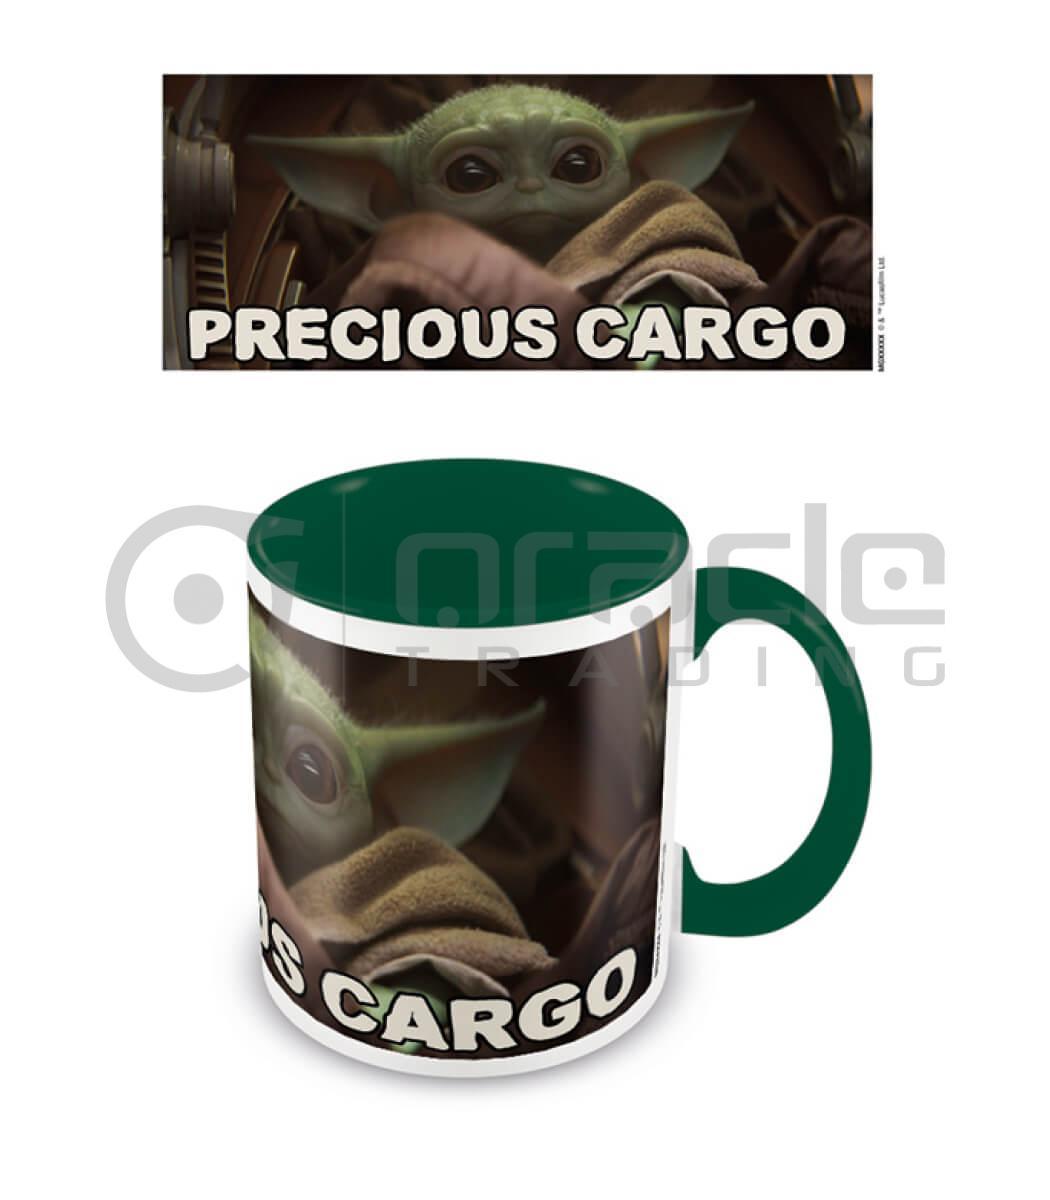 Star Wars: The Mandalorian Precious Cargo Mug - Inner Coloured